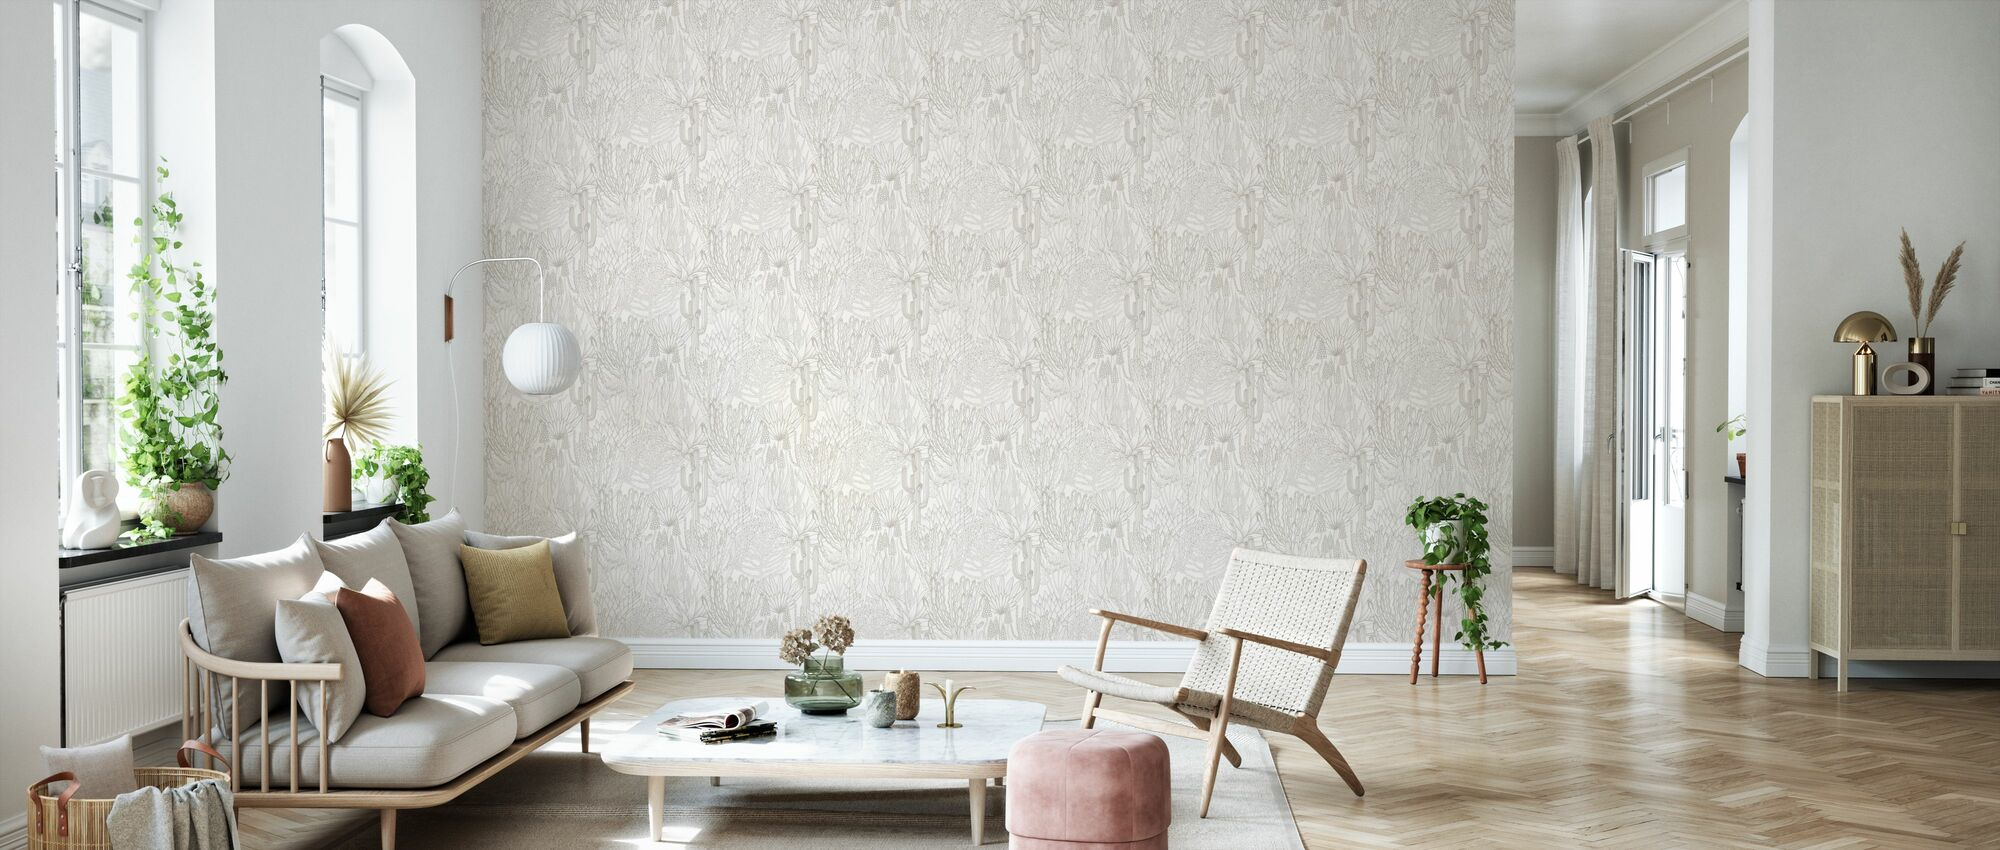 Euphorbia Forest - Bone - Wallpaper - Living Room